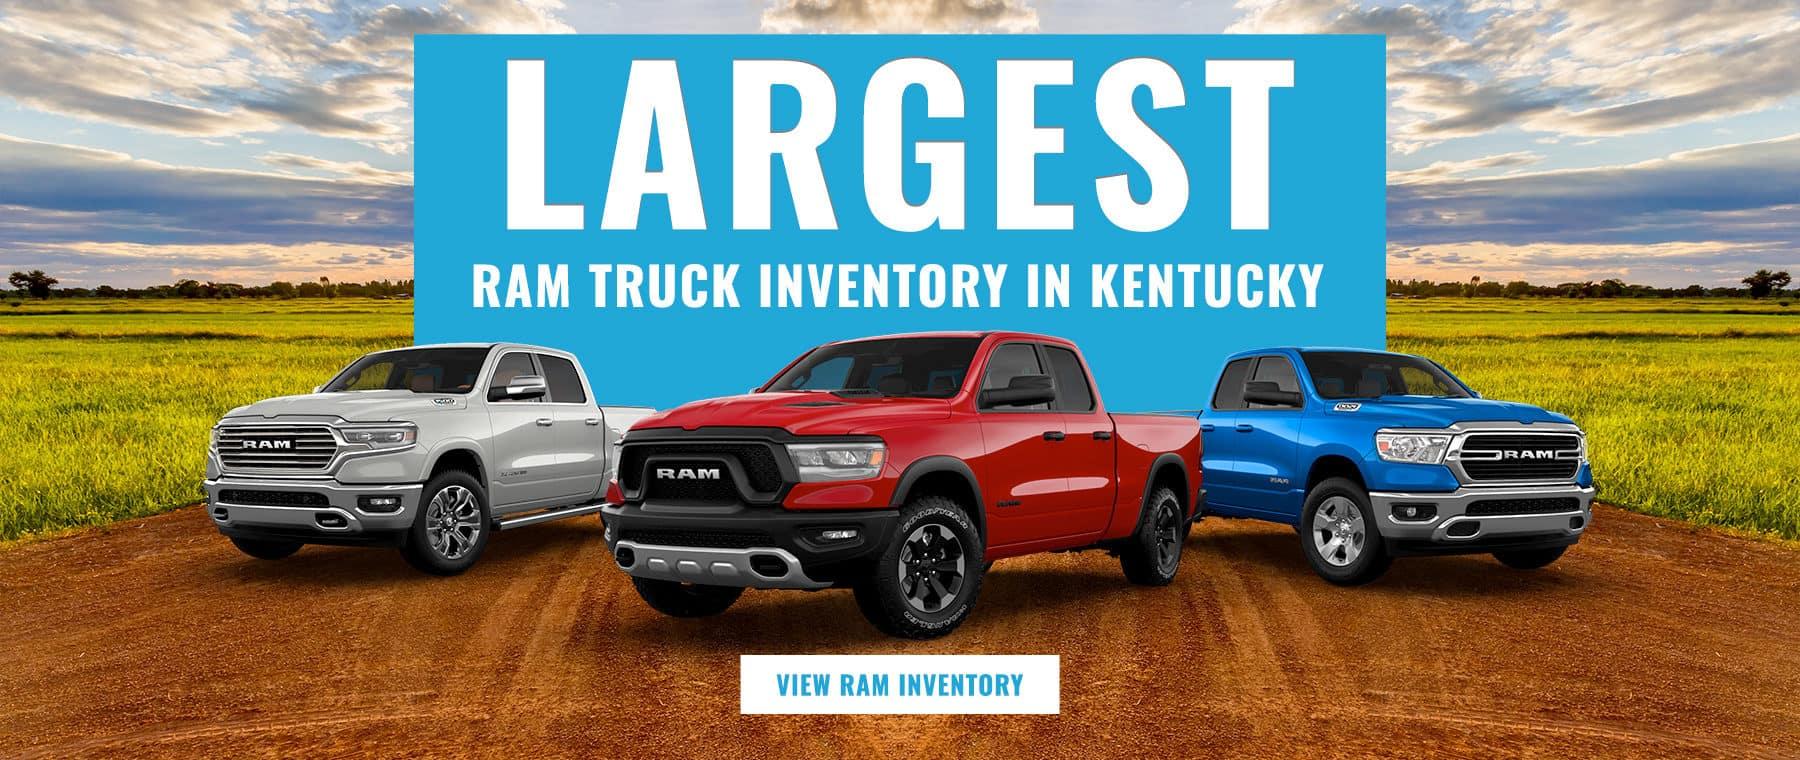 Largest Ram Truck Inventory in Kentucky